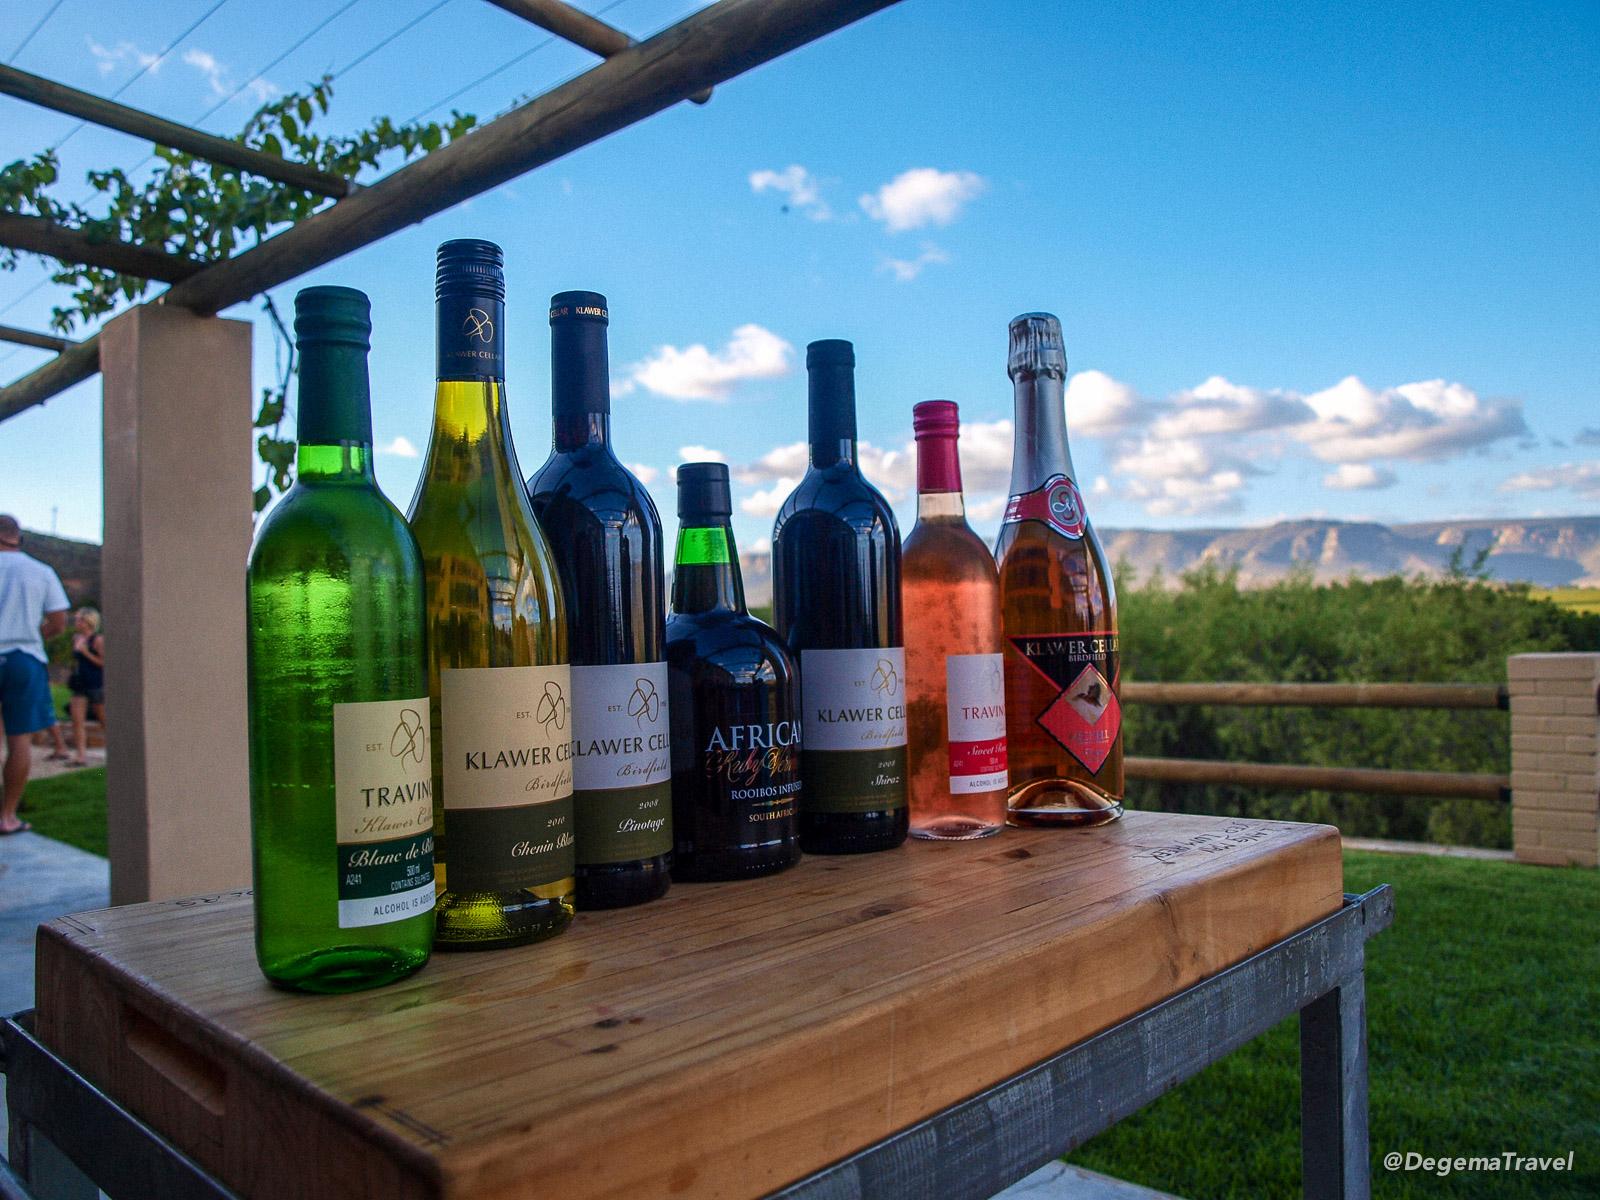 Wines from Highlander Vineyard, South Africa